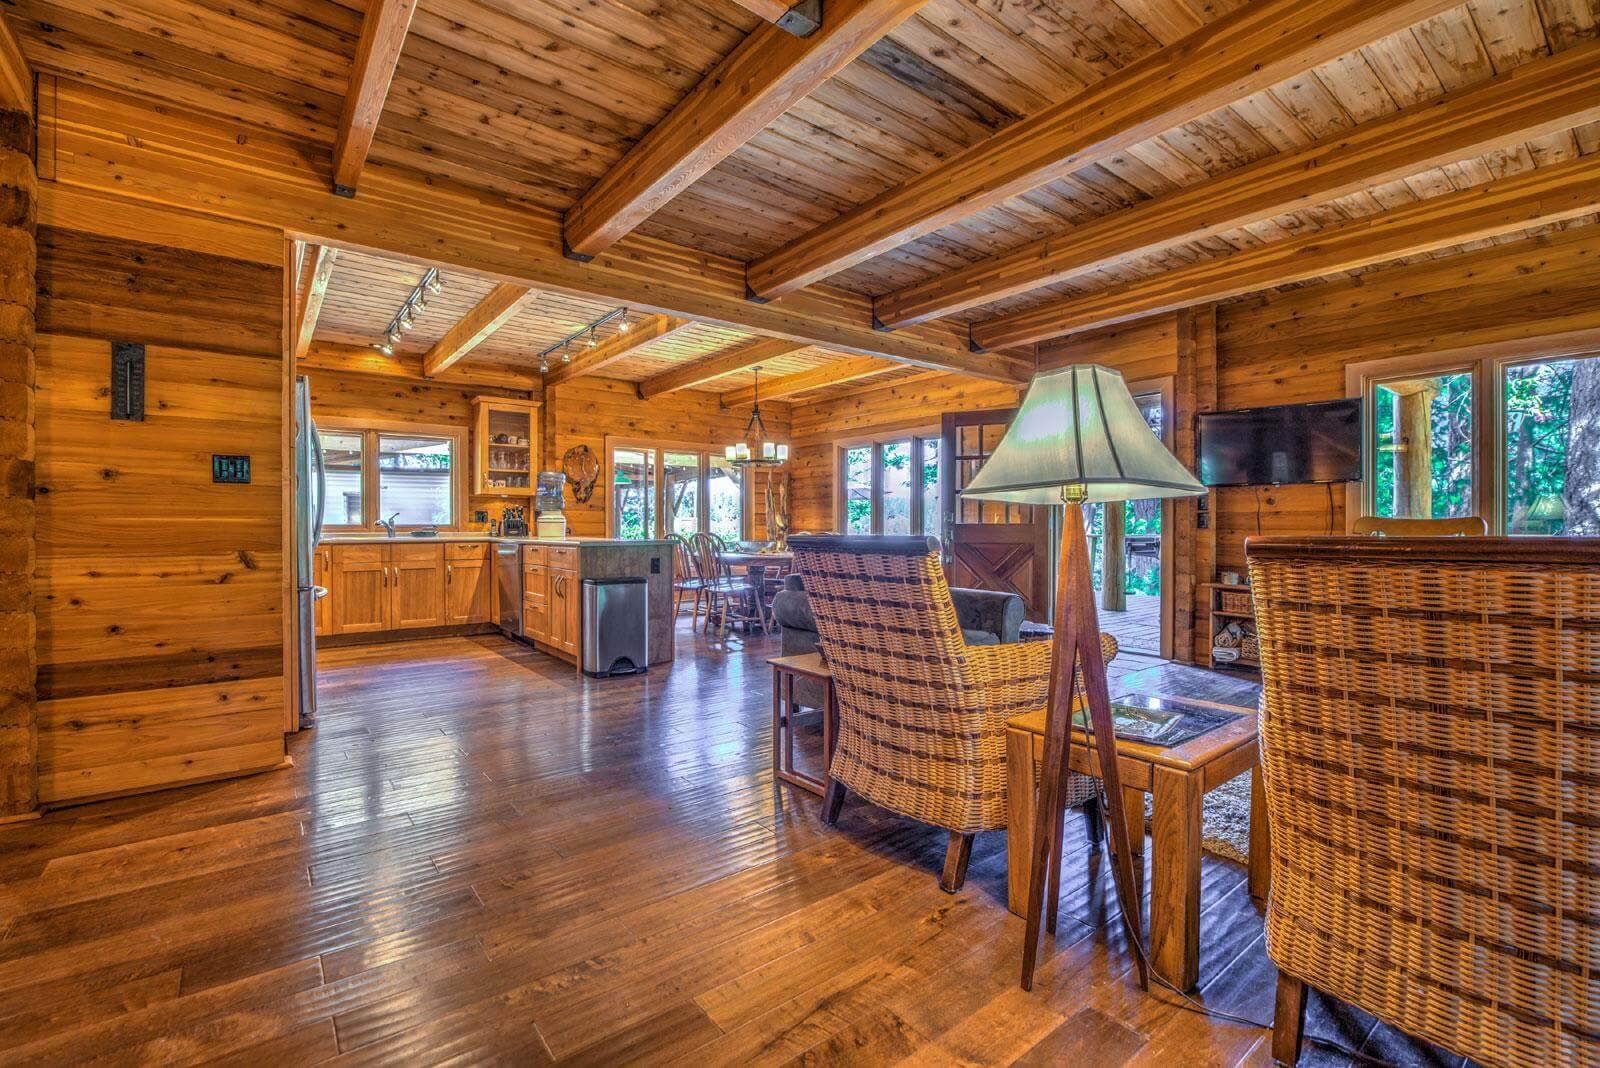 Design Your Own Log Home Online Rustic Sophistication Pan Abode